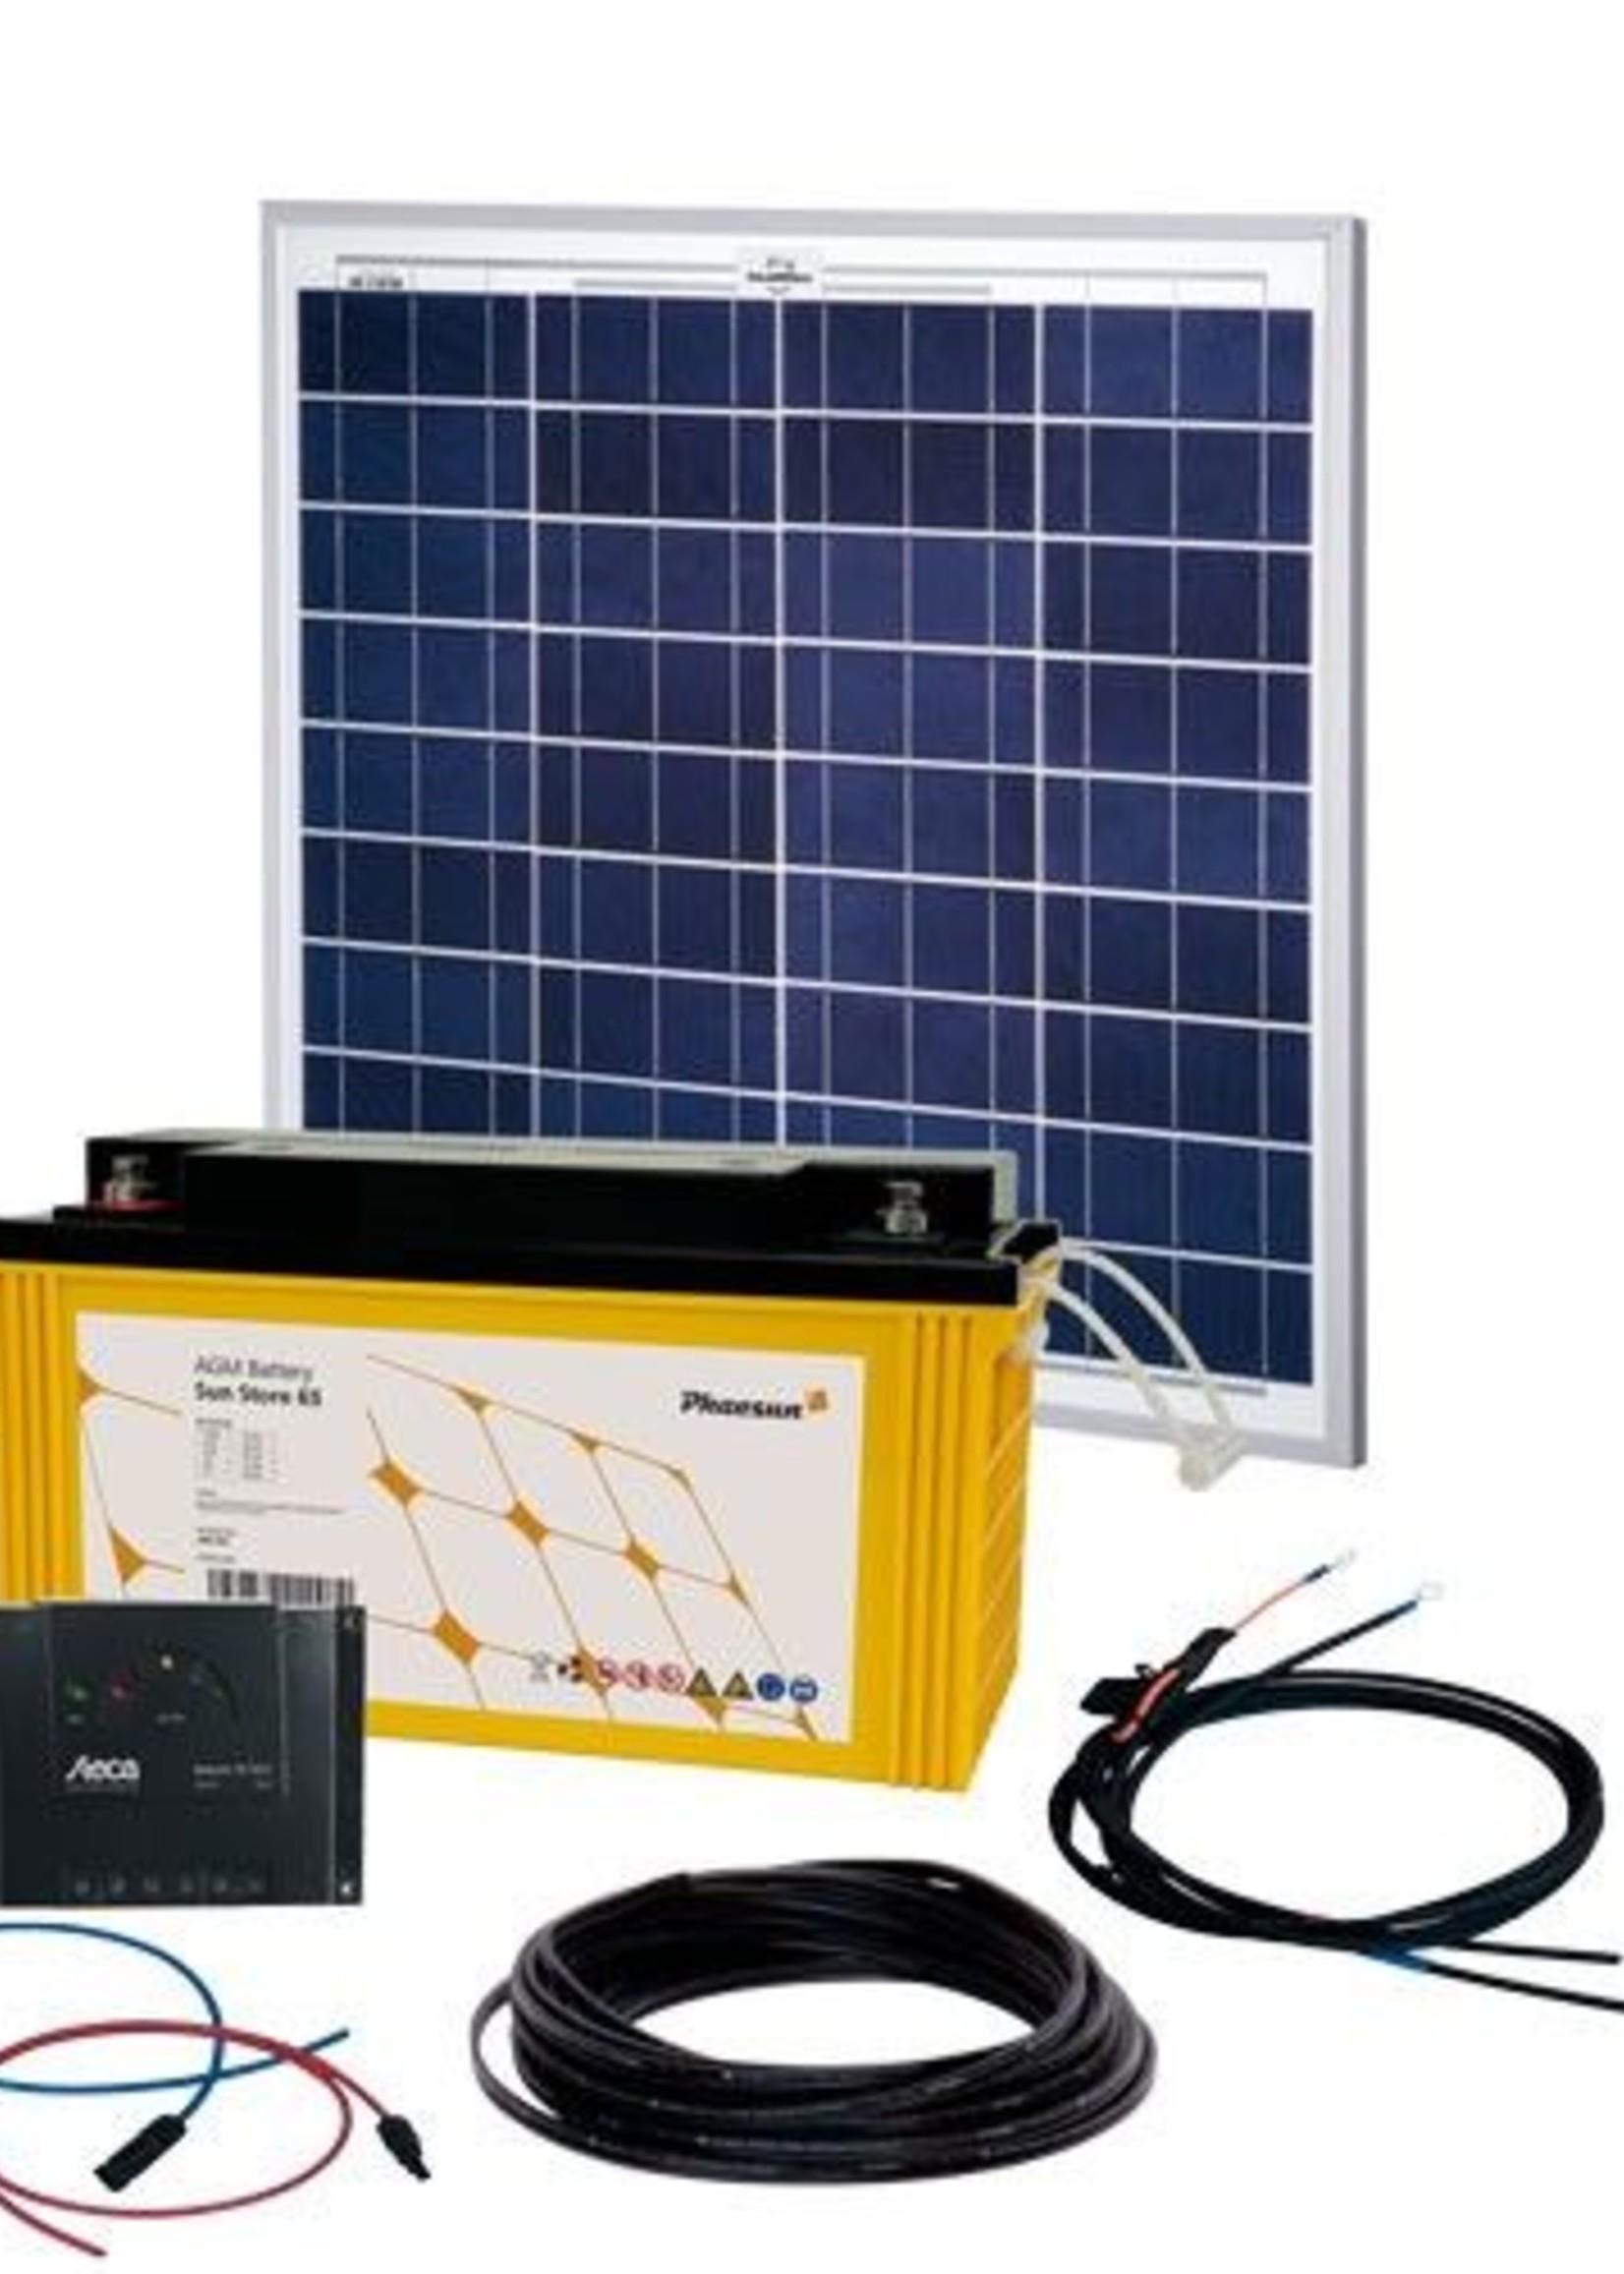 Phaesun Energy Generation Kit Solar Rise One 2.0 50W/12V